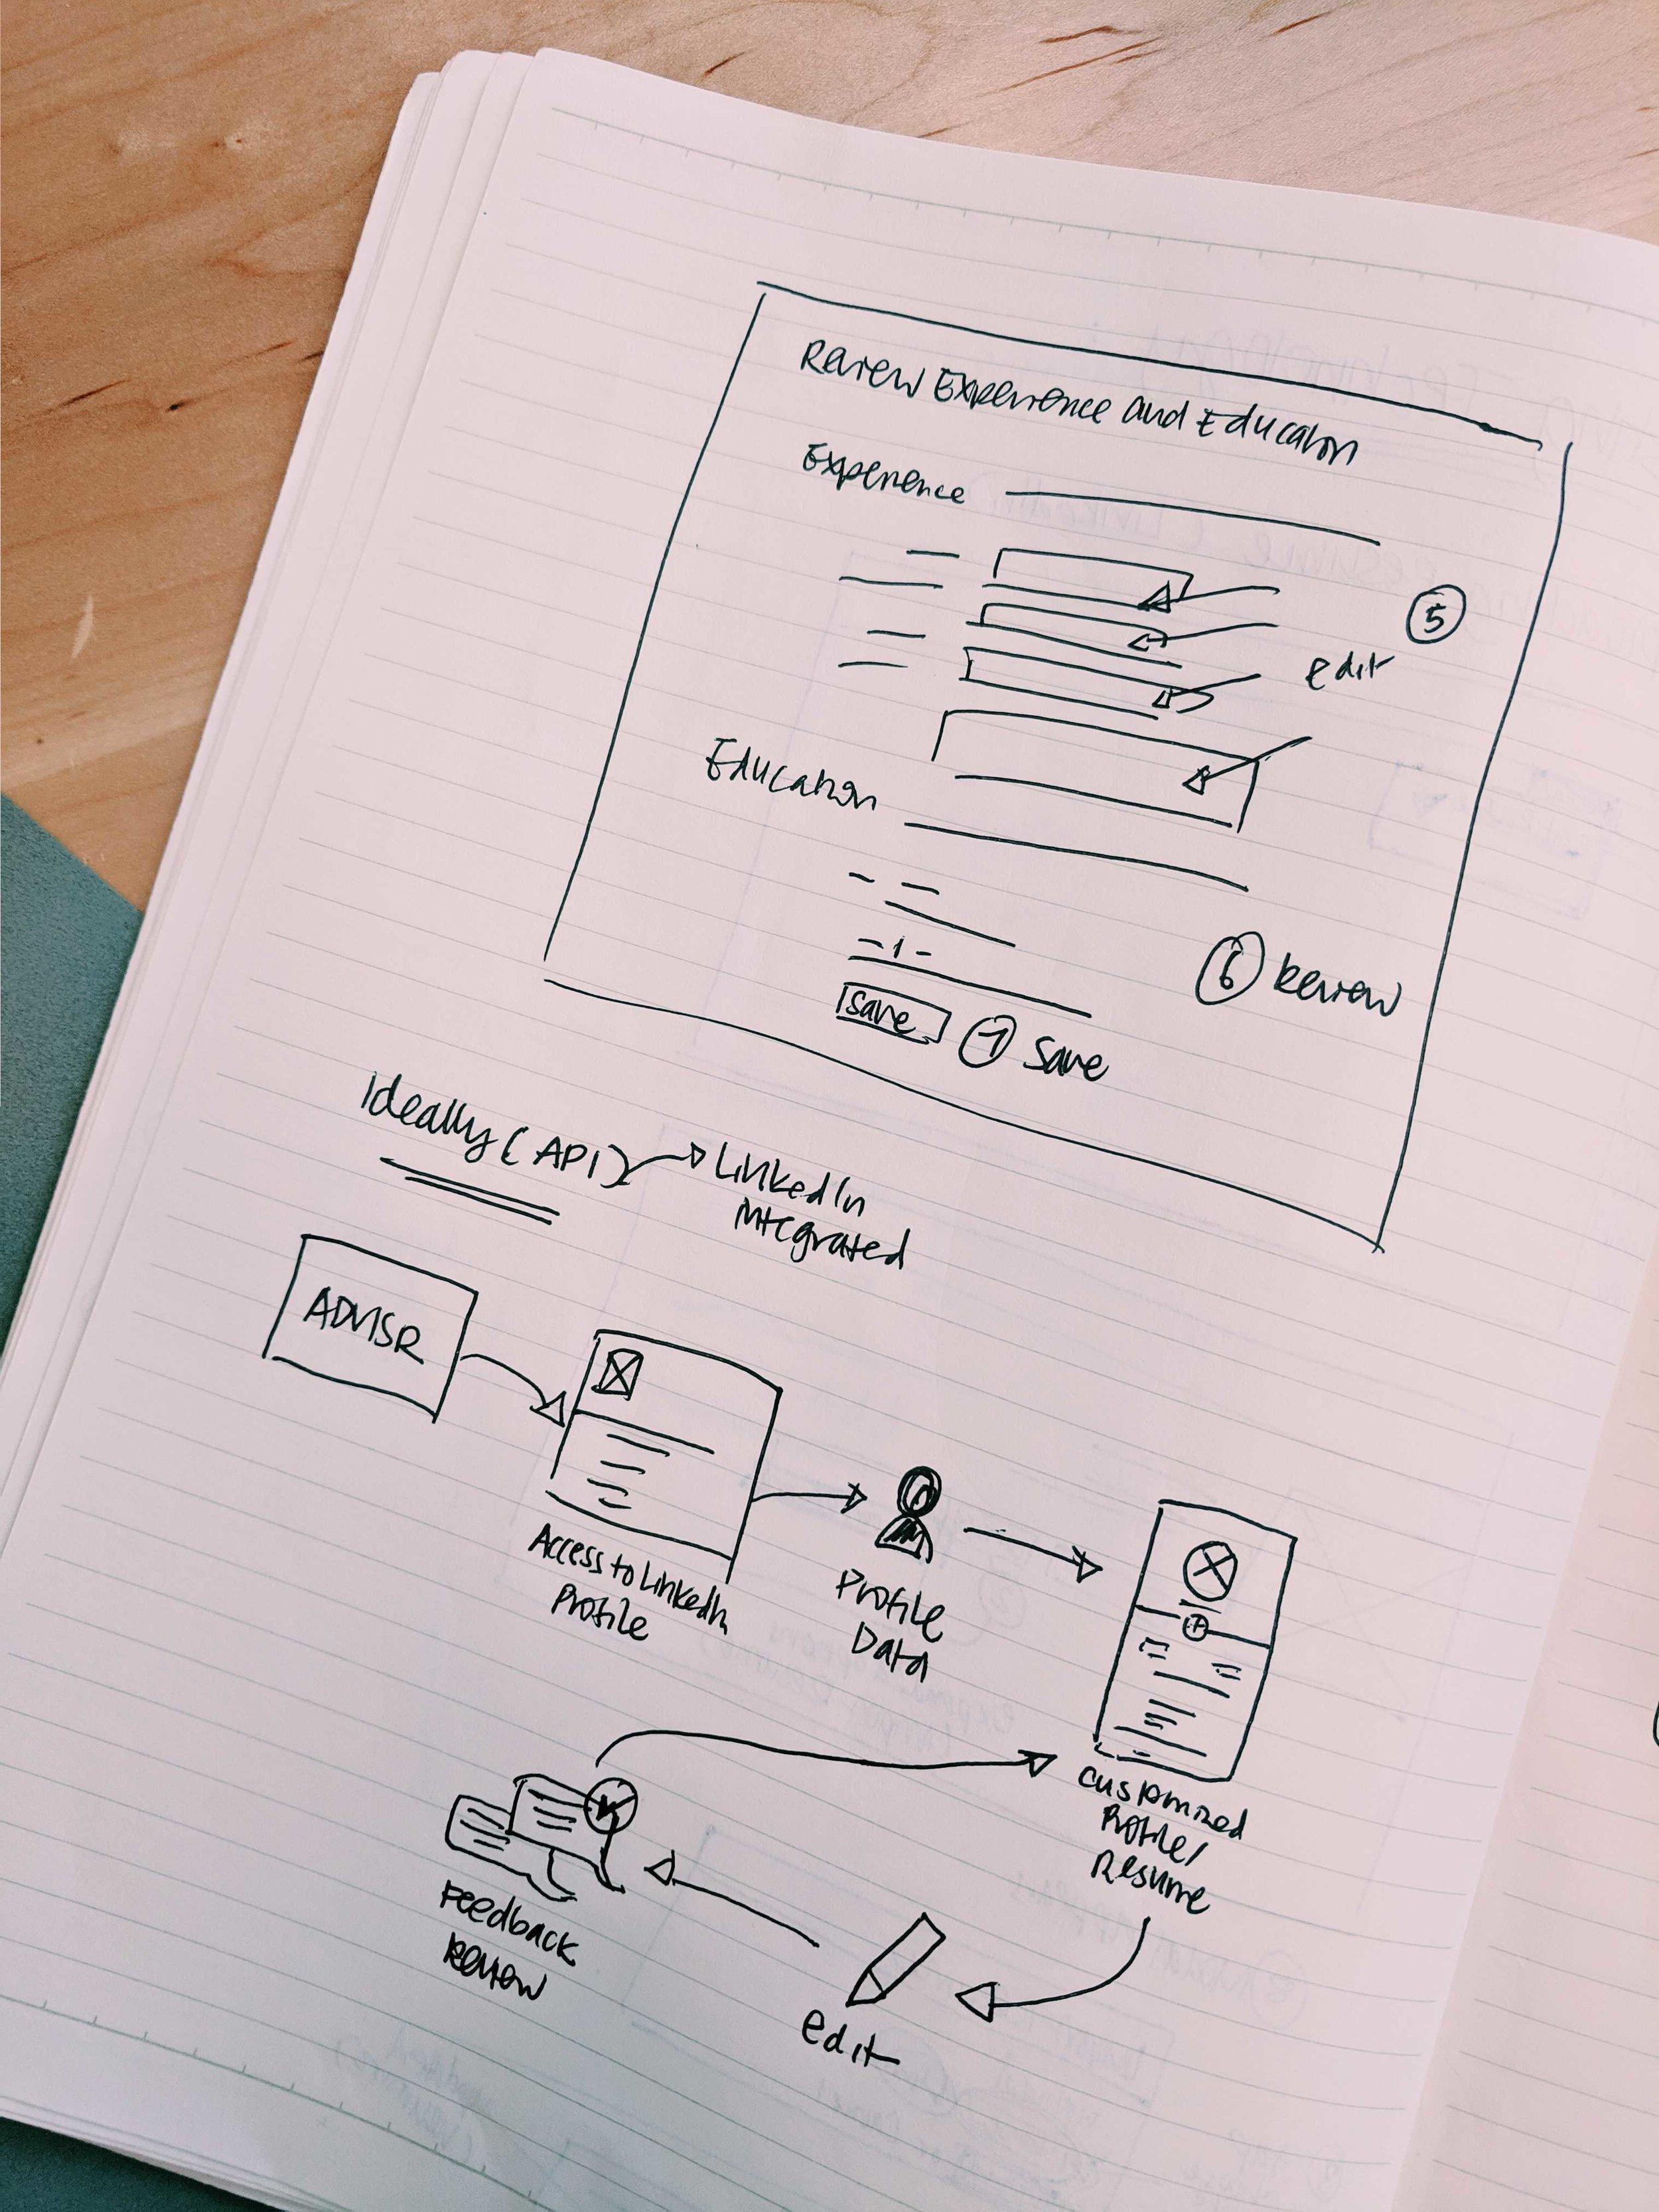 Understanding LinkedIn integration